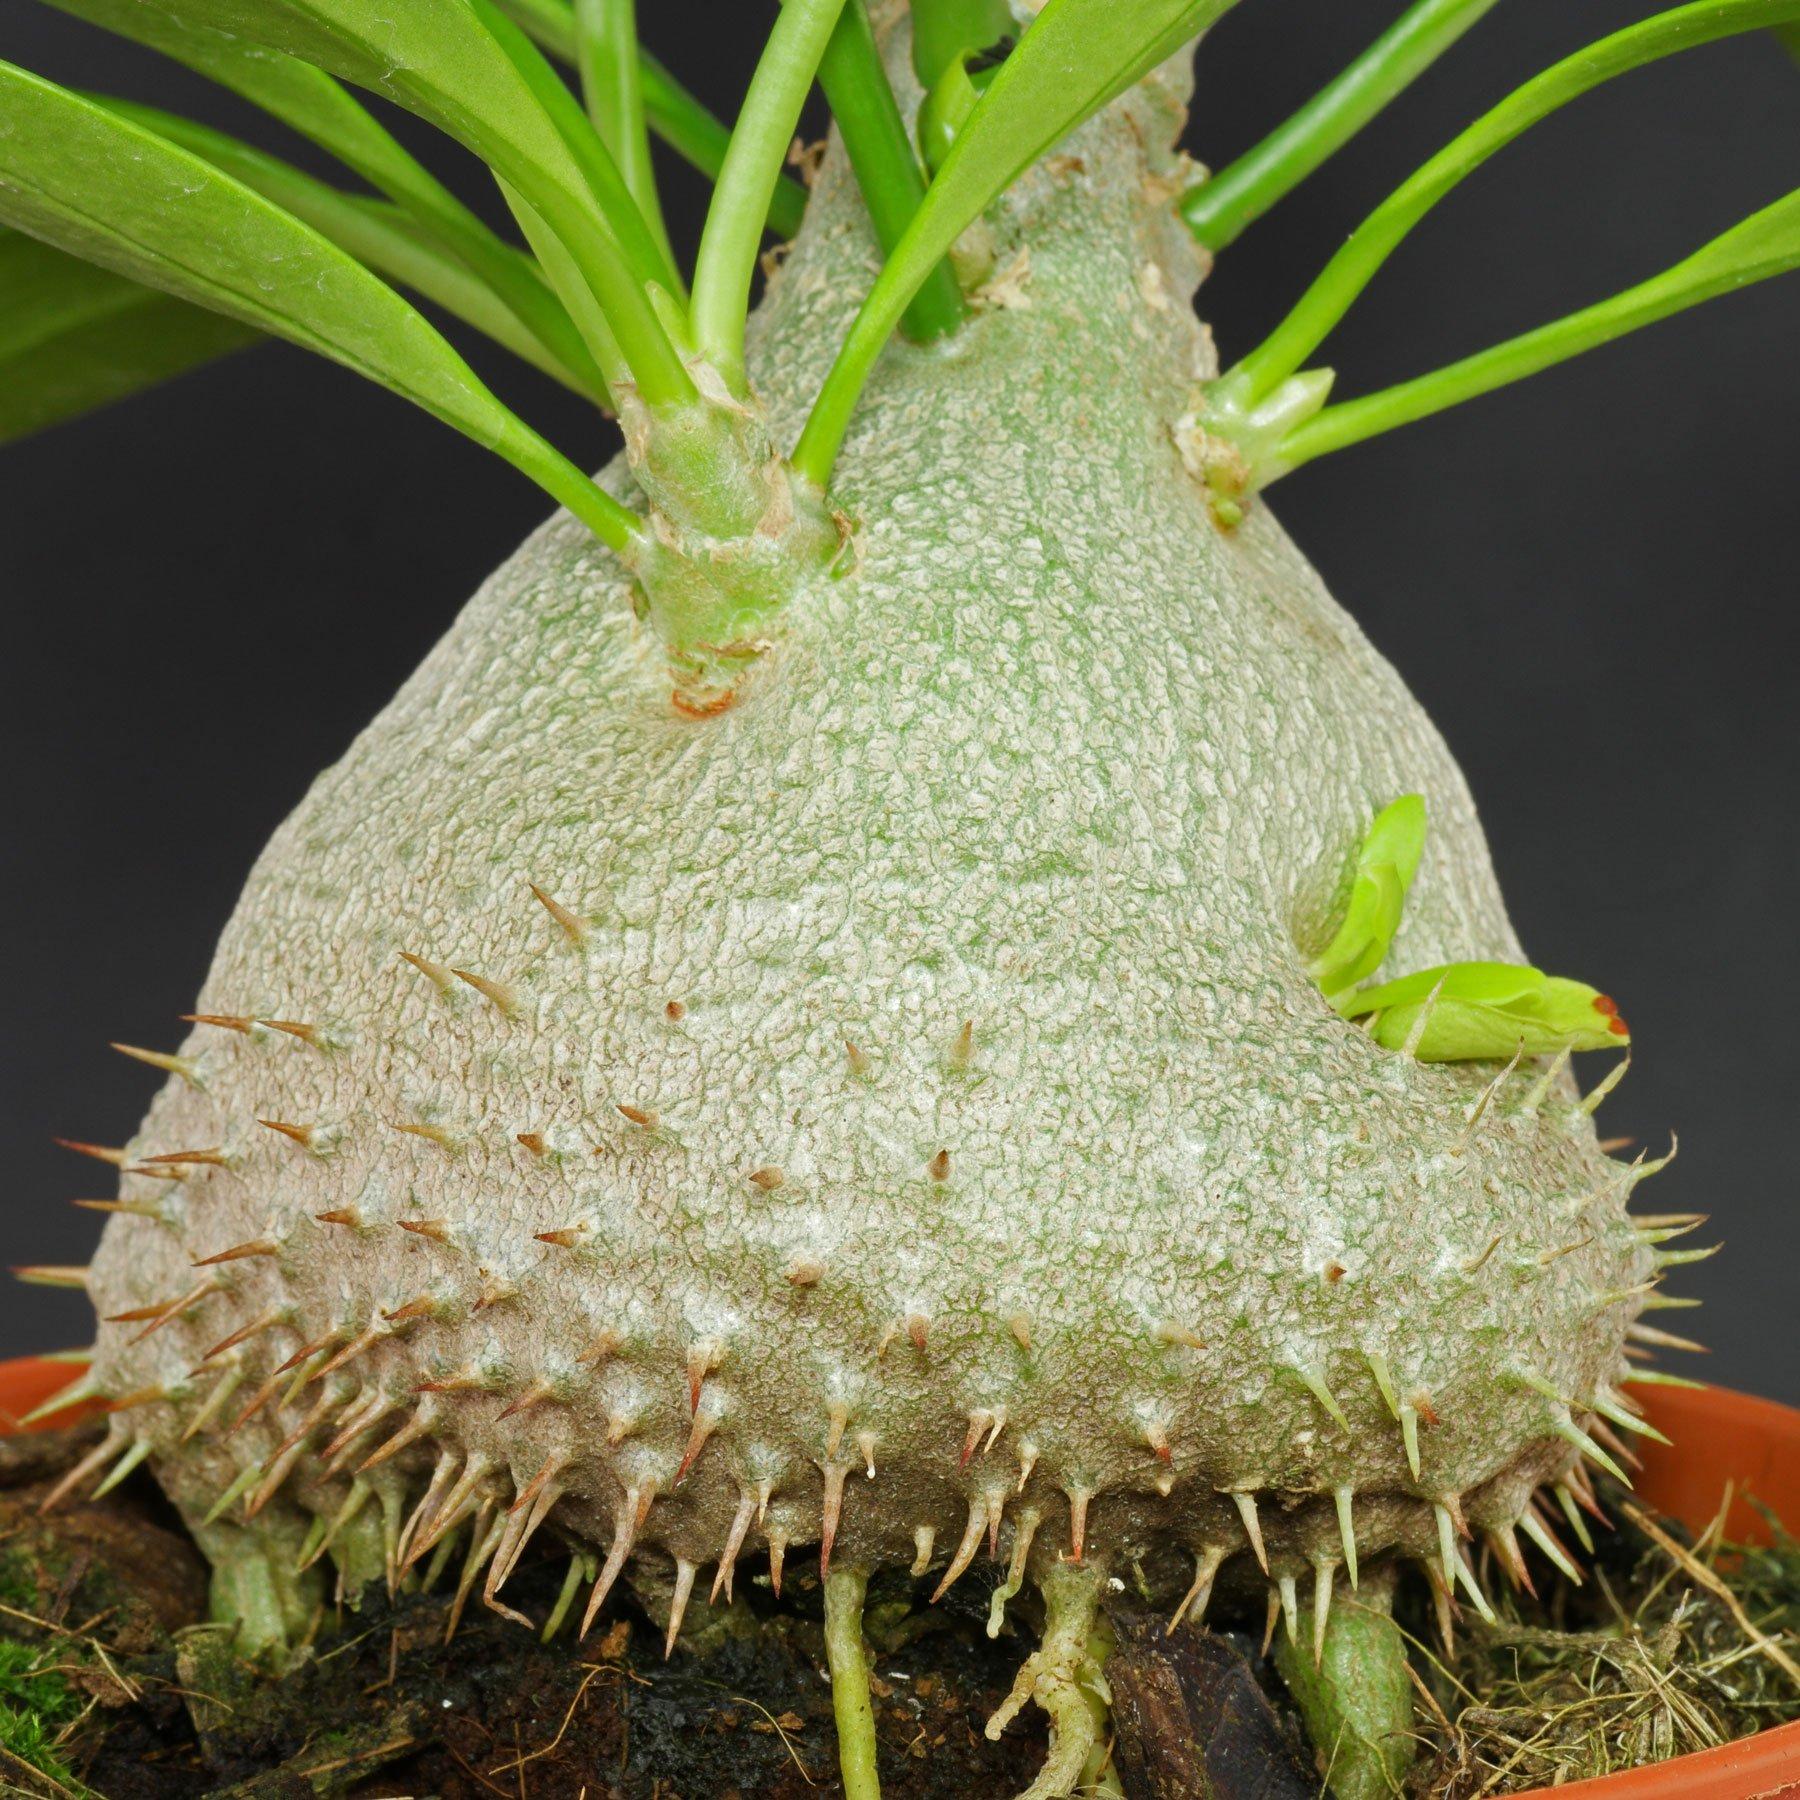 Myrmecodia beccarii